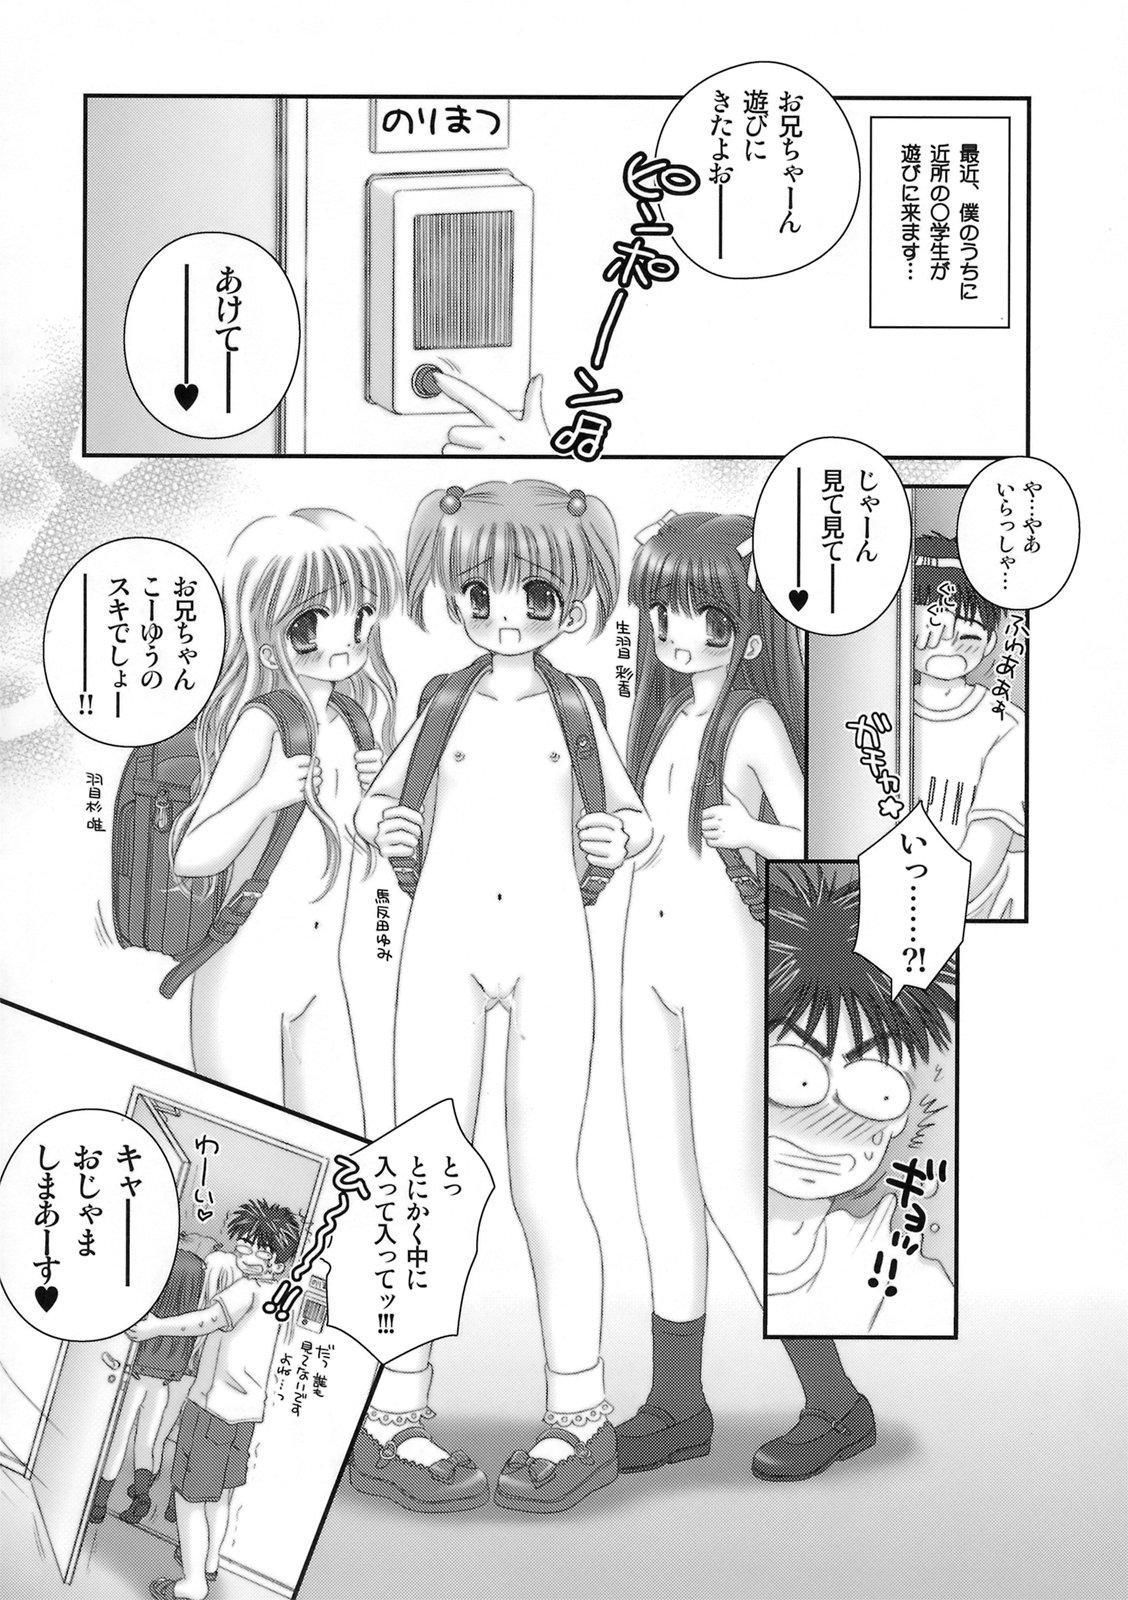 Hadaka Randosel Girls 2